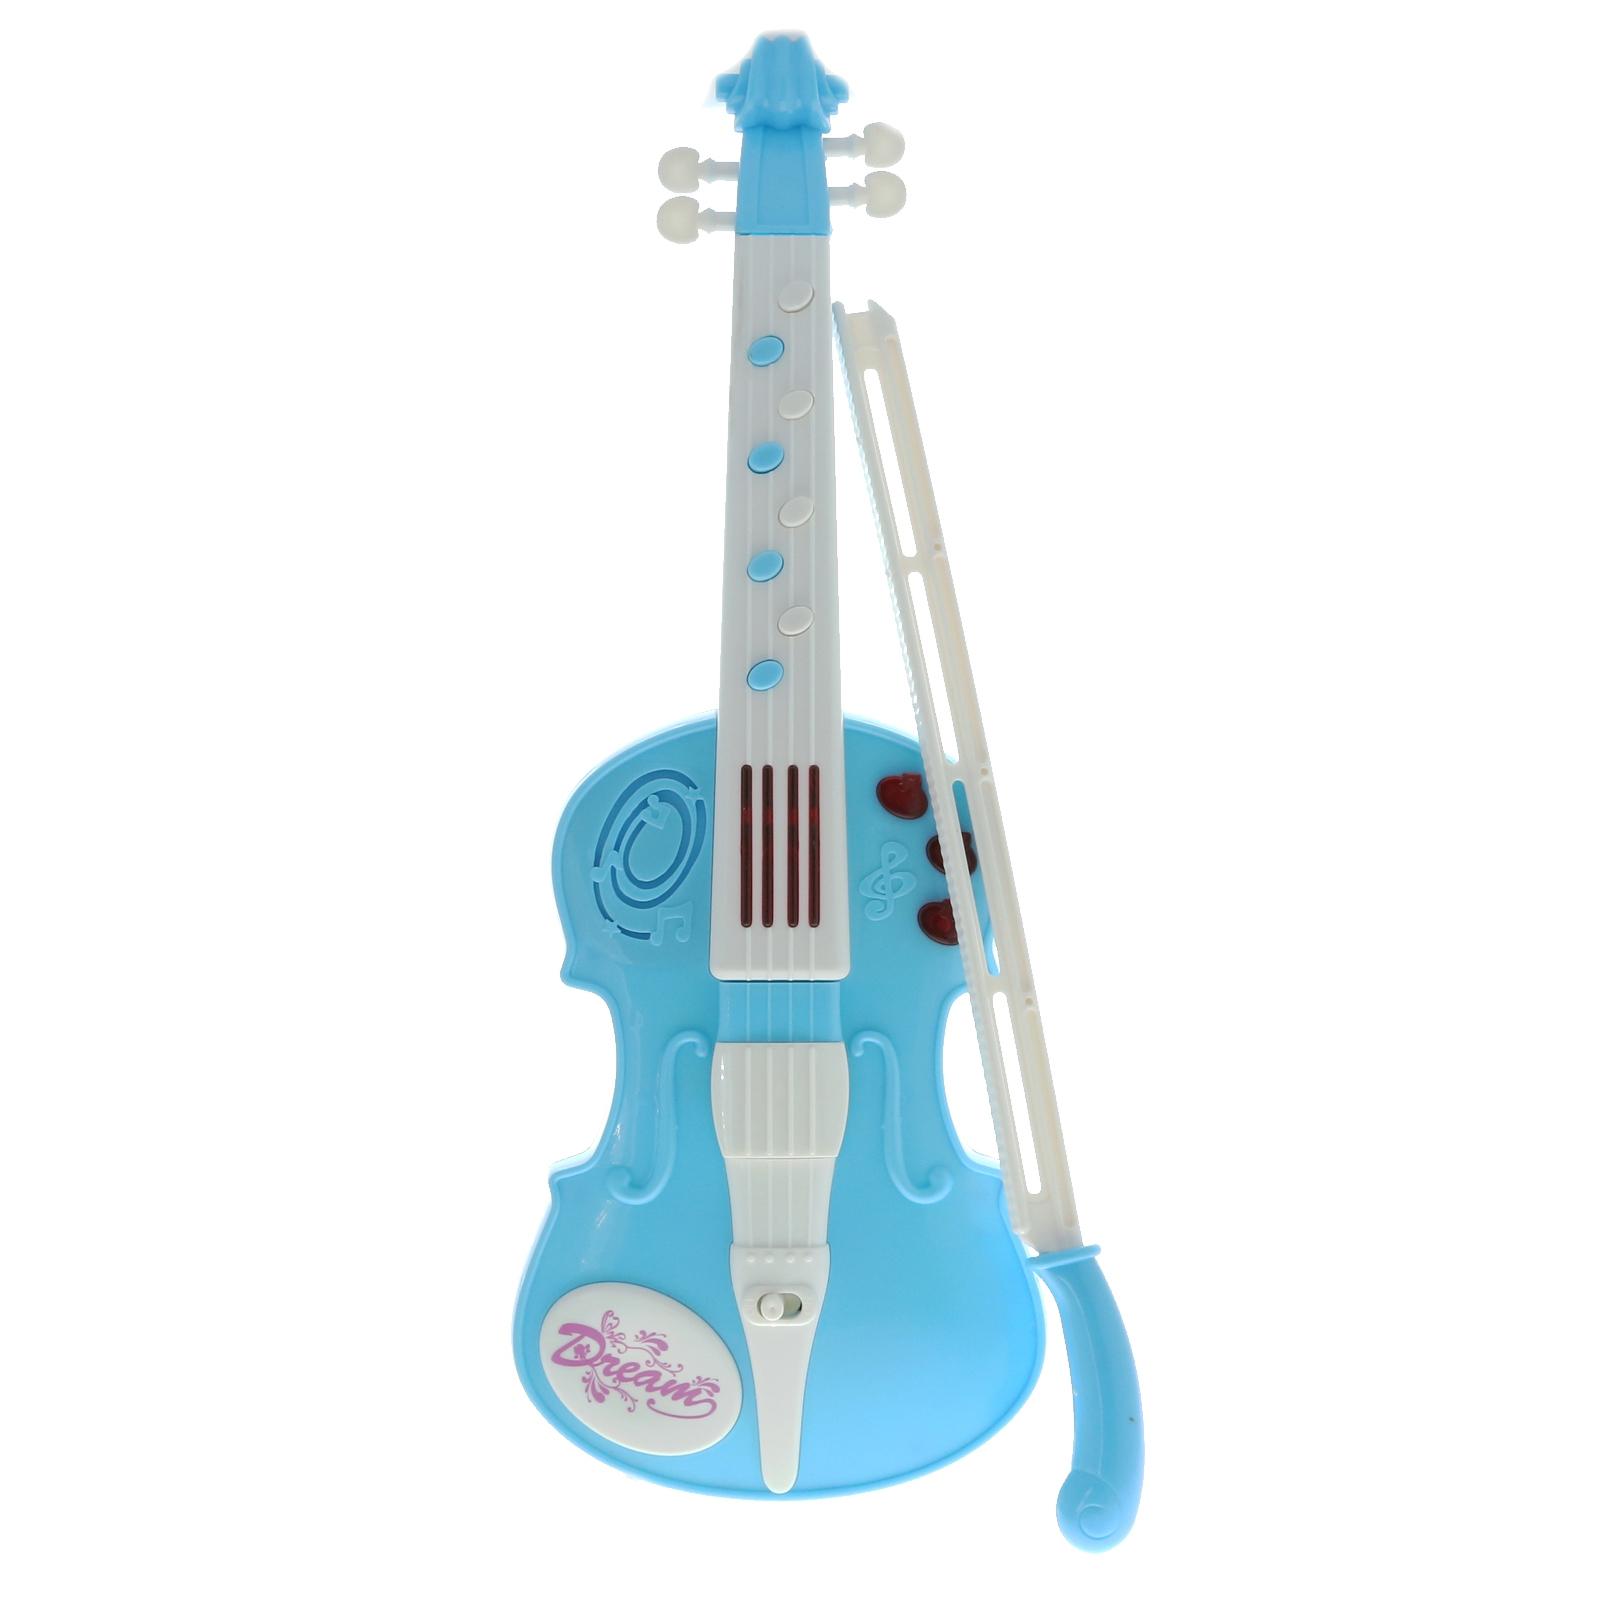 TychoTyke Musical Violin Instrument Pretend Play Kids Light Up Toy - Blue